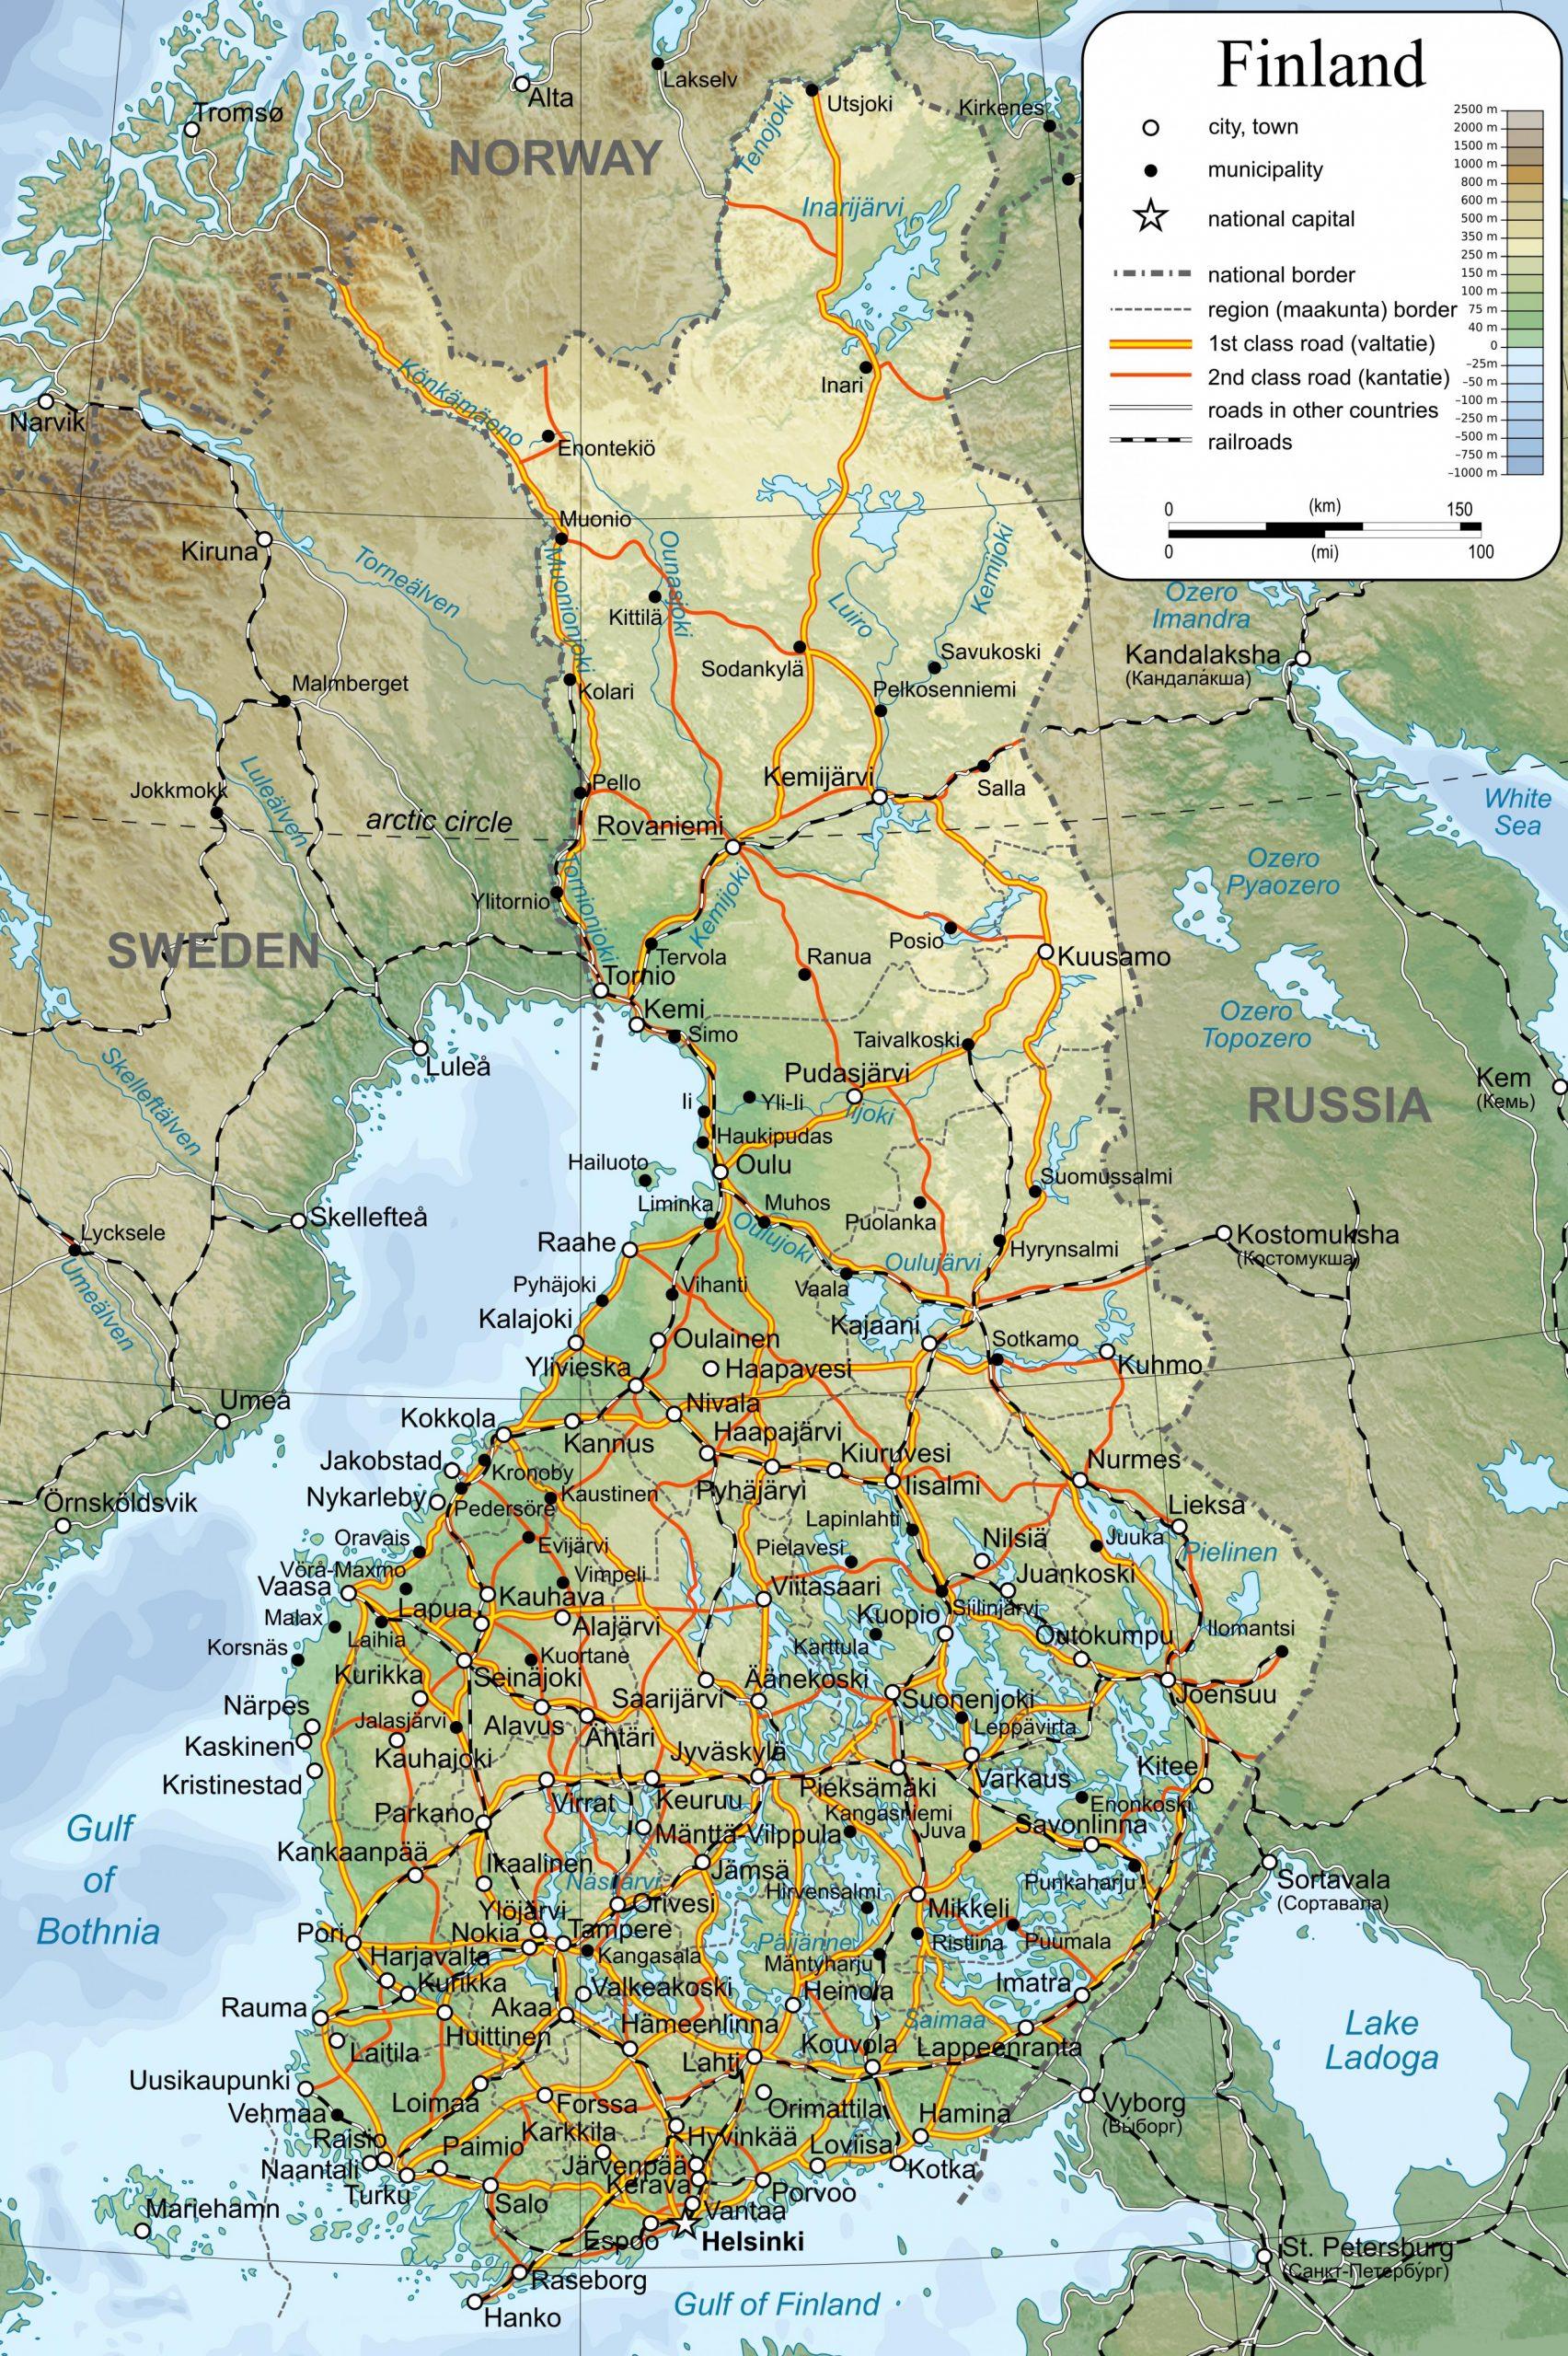 Carte Détaillée De La Finlande - Carte De La Carte Détaillée pour Carte De L Europe Détaillée